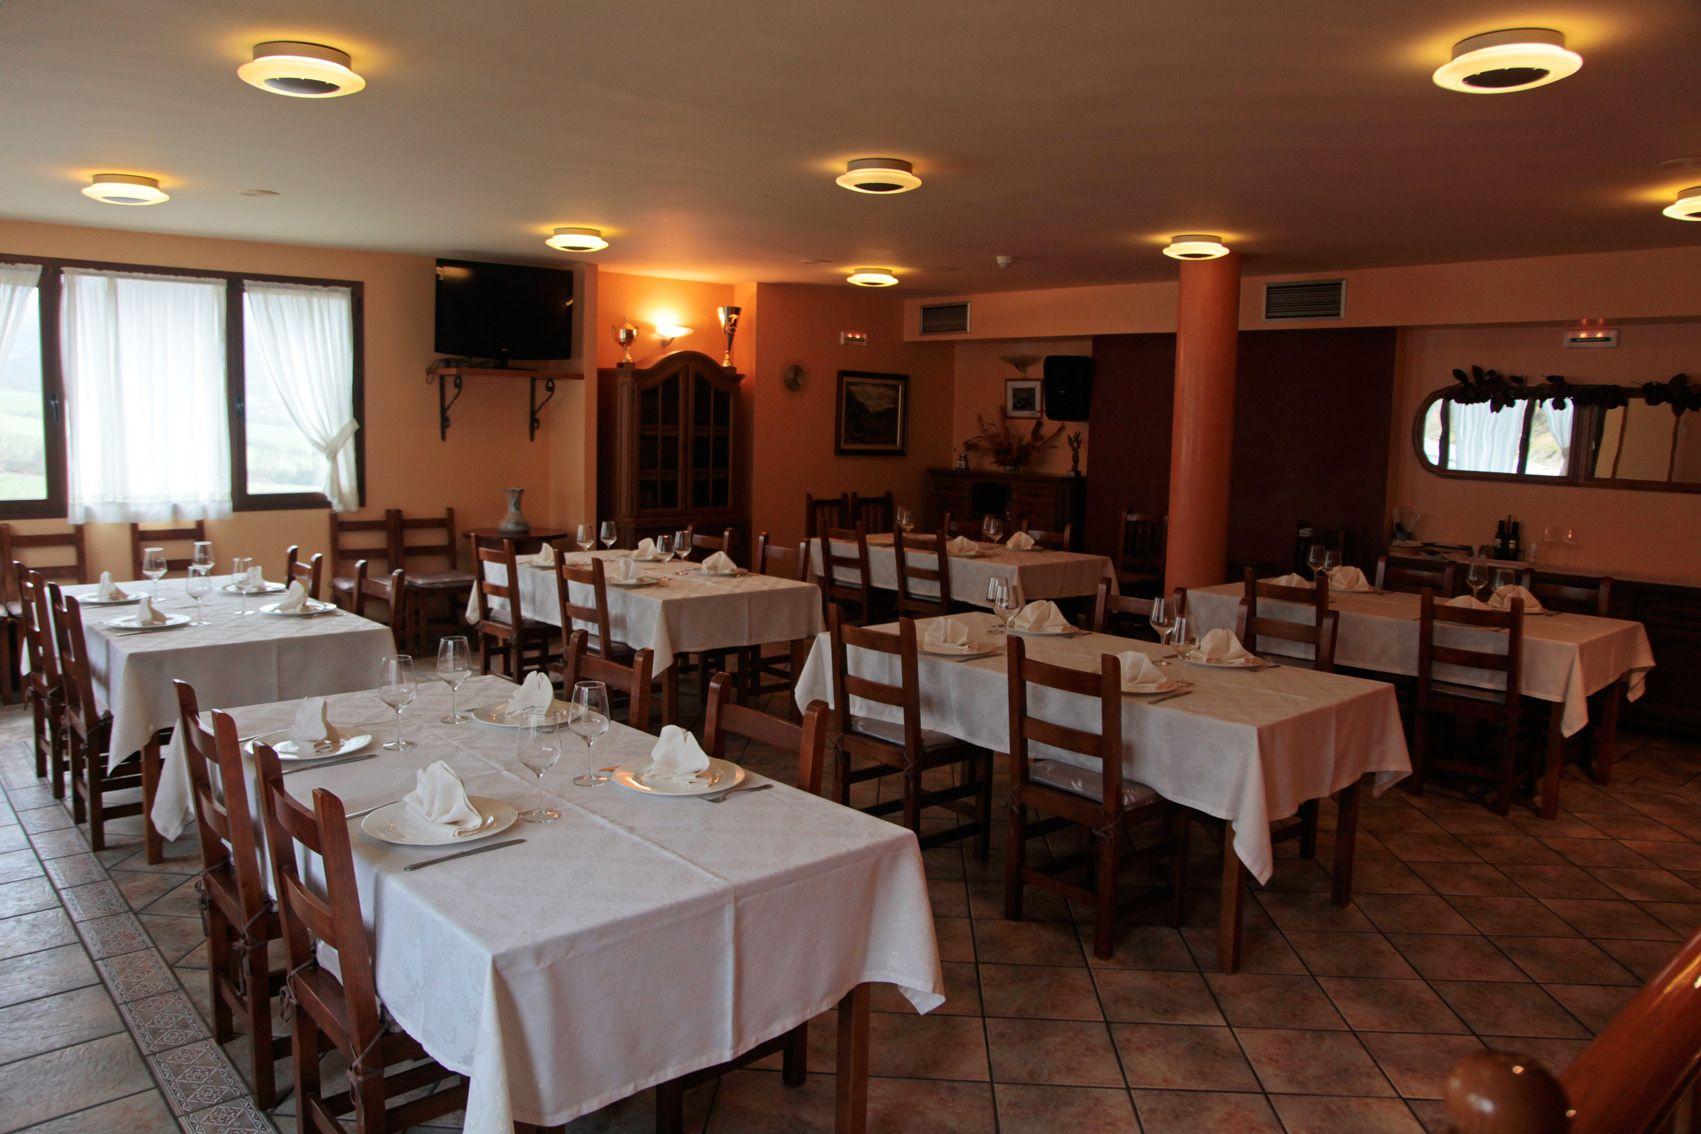 Foto 1 de Restaurante en Juslapeña | Restaurante Casa Arteta